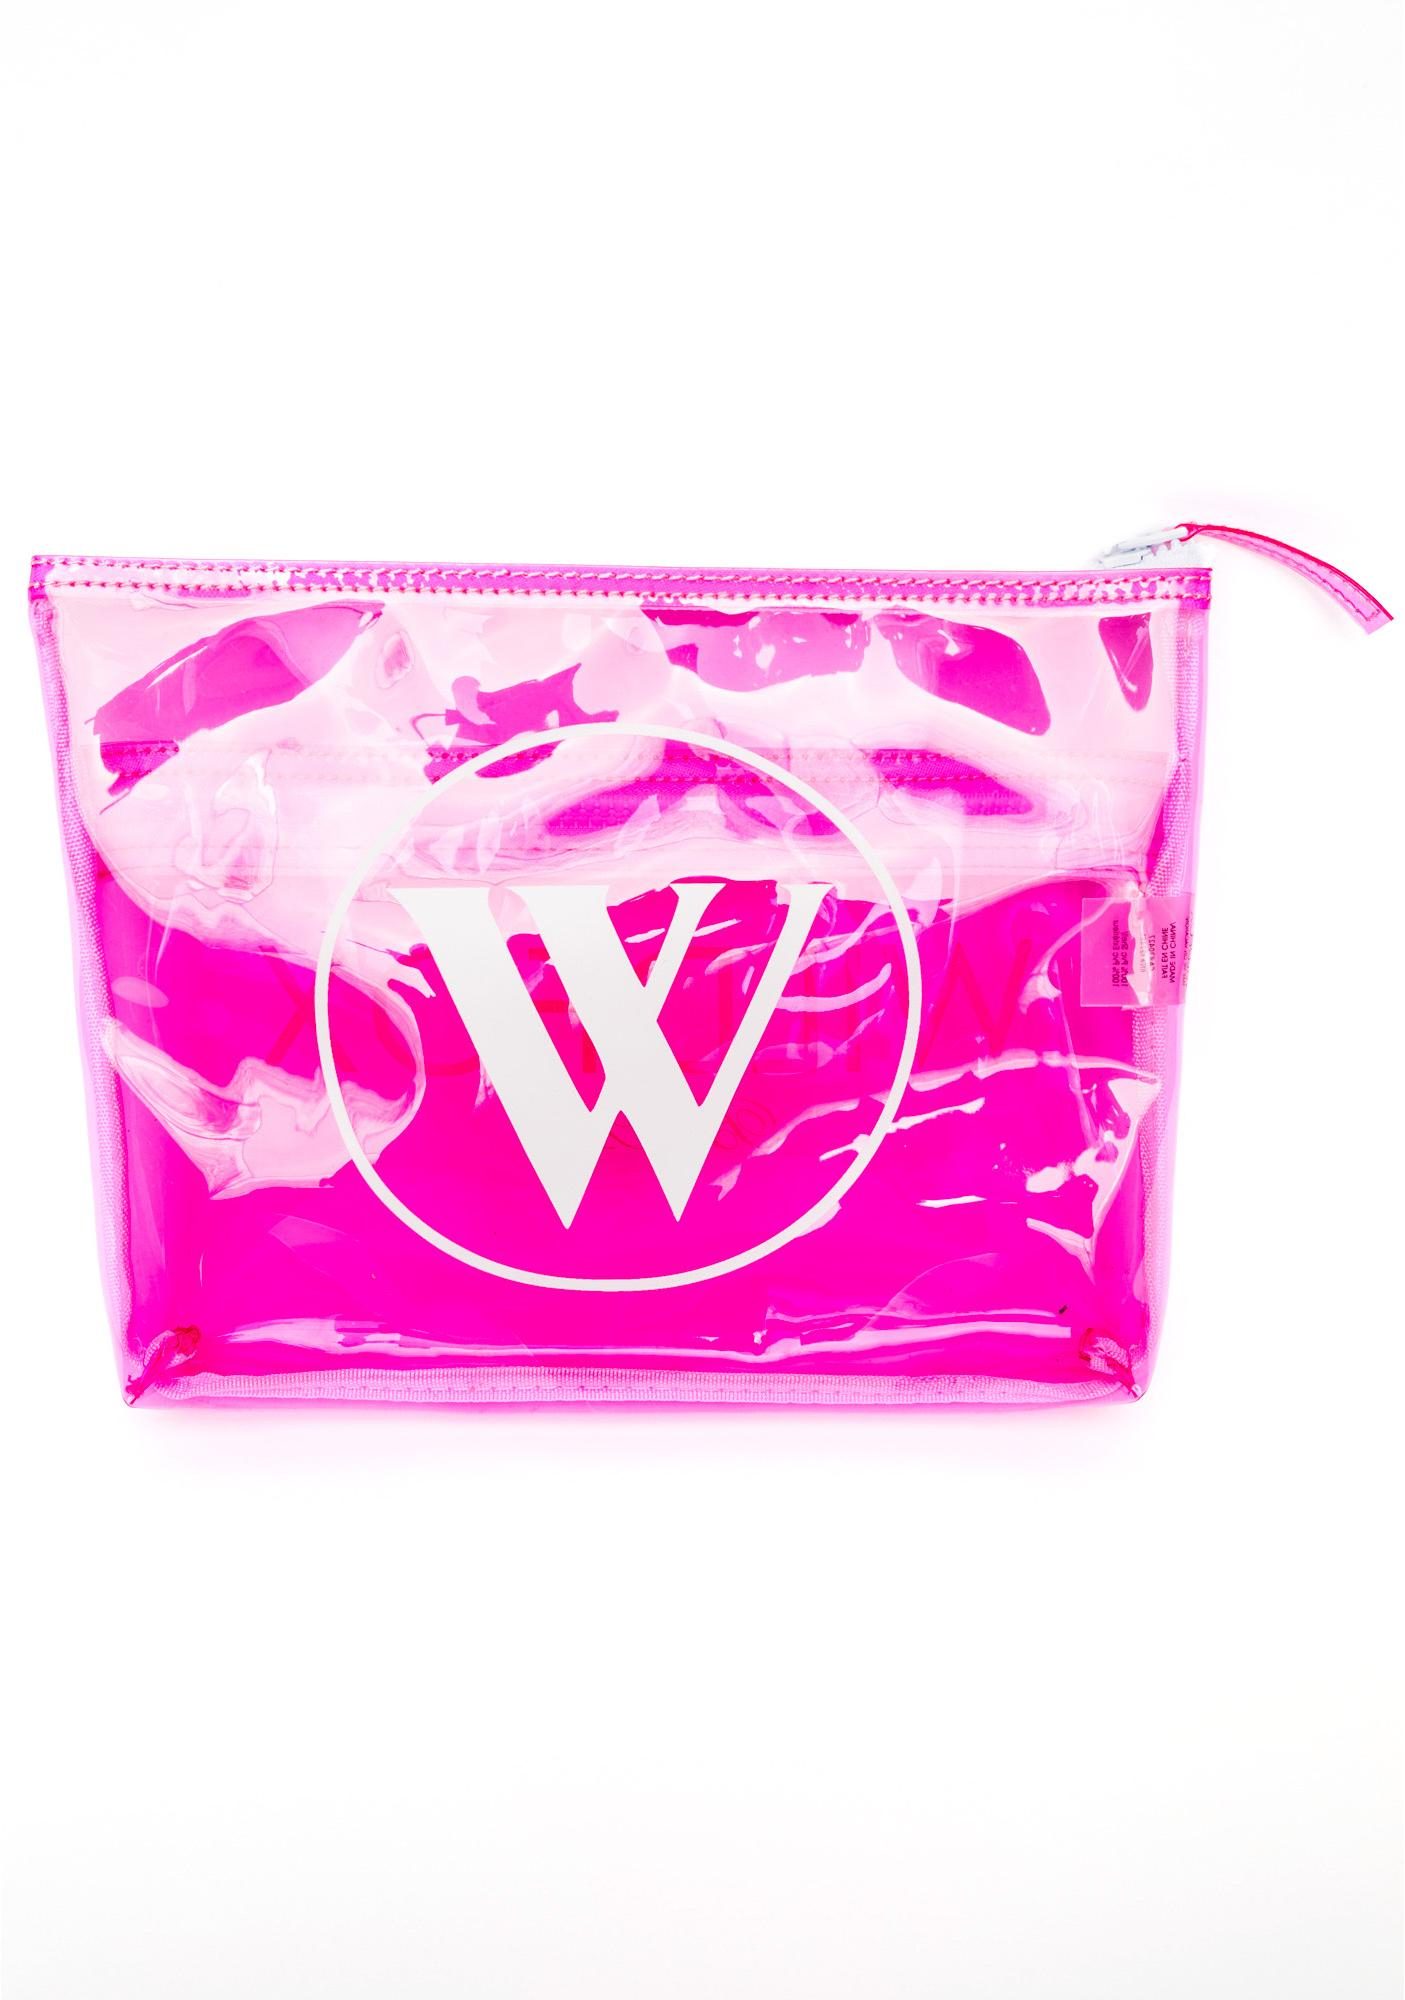 Wildfox Couture Wildfox Bel Air Vinyl Bikini Bag